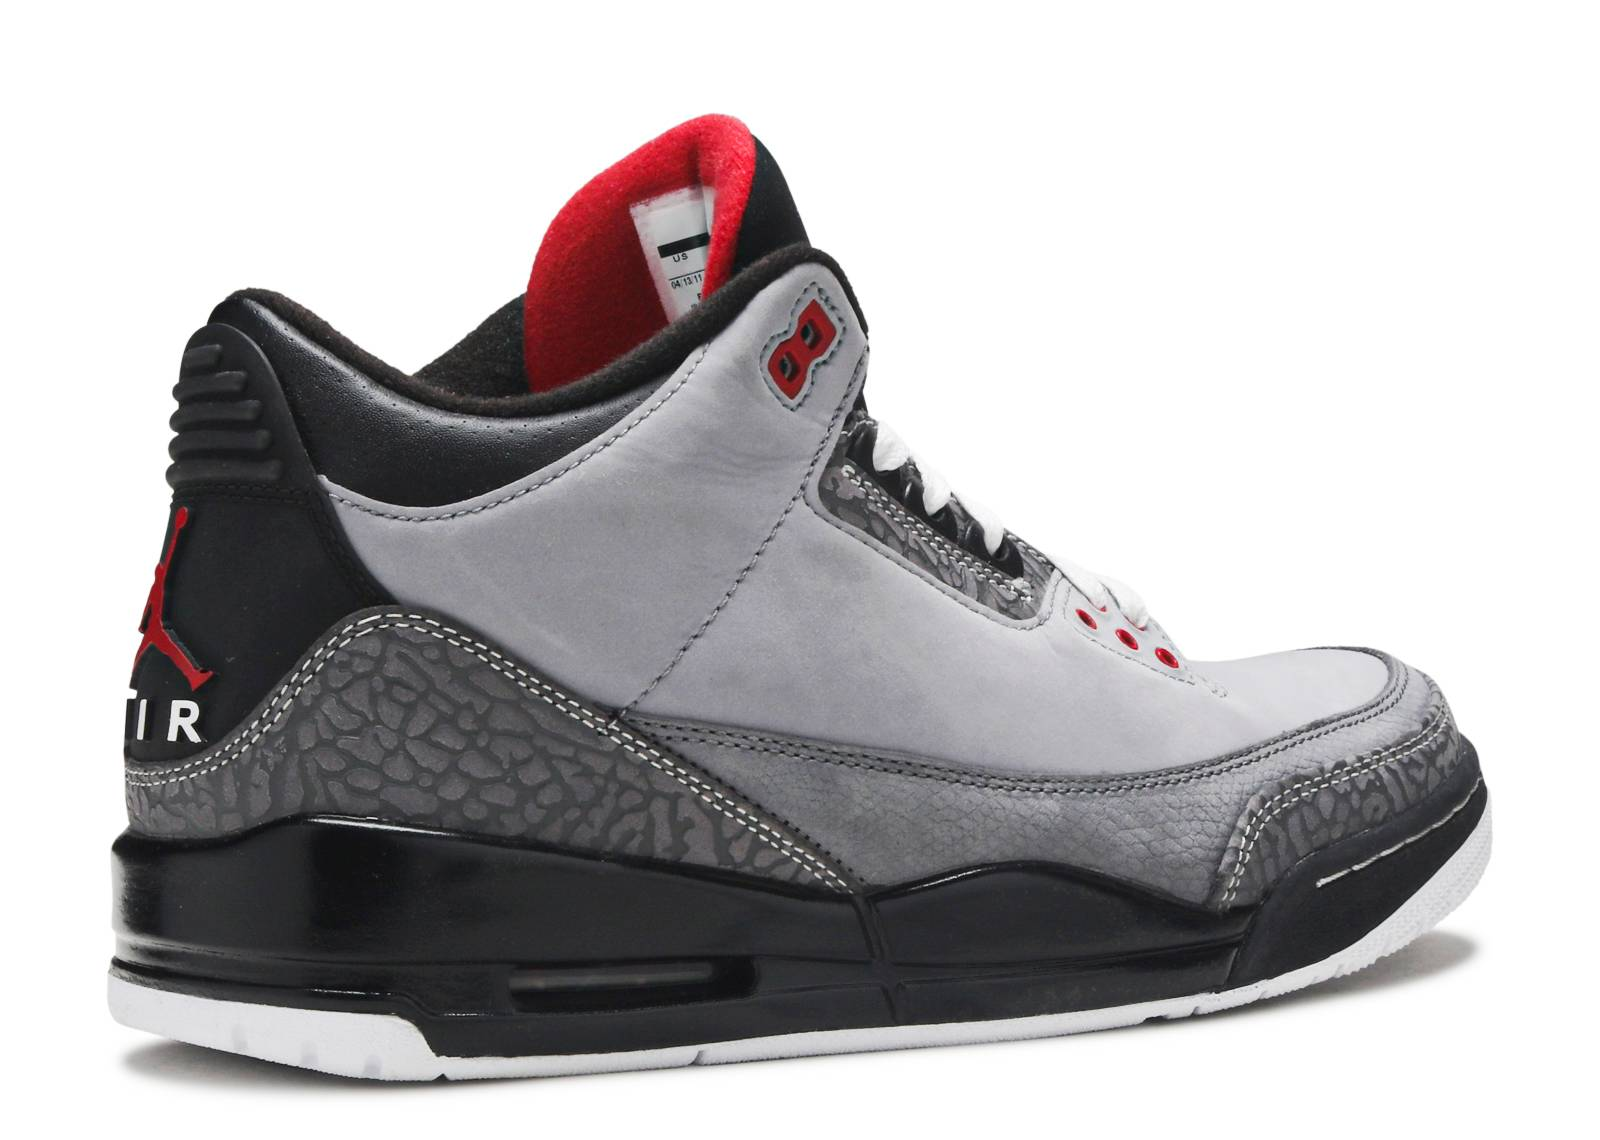 finest selection c3450 48e07 Air Jordan 3 Retro